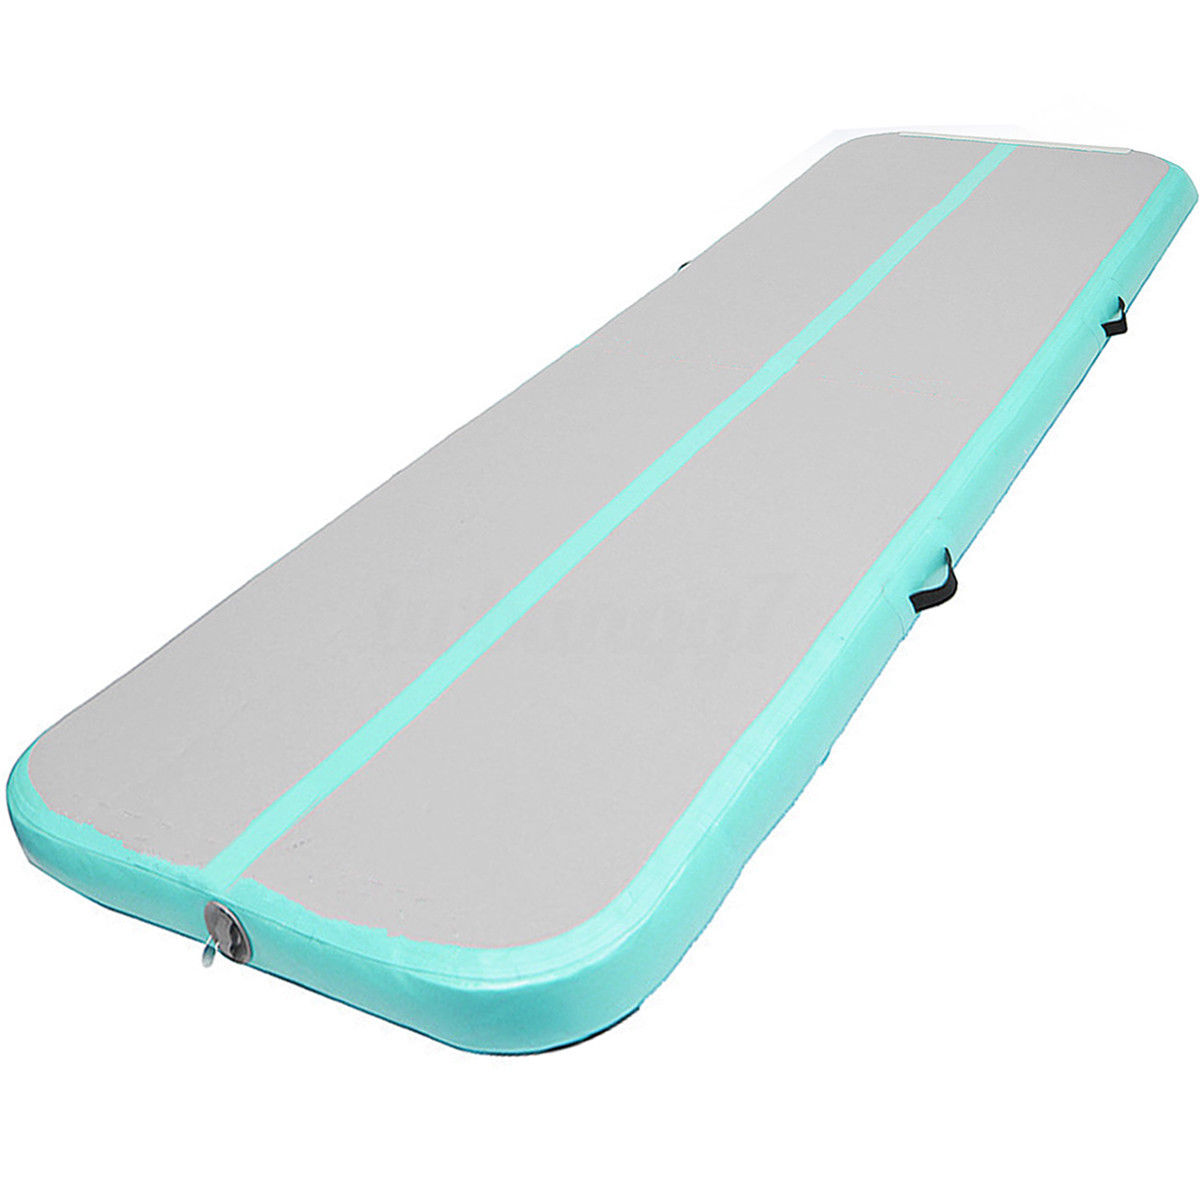 10ft Inflatable Air Track Tumbling Floor Gymnastics Mat